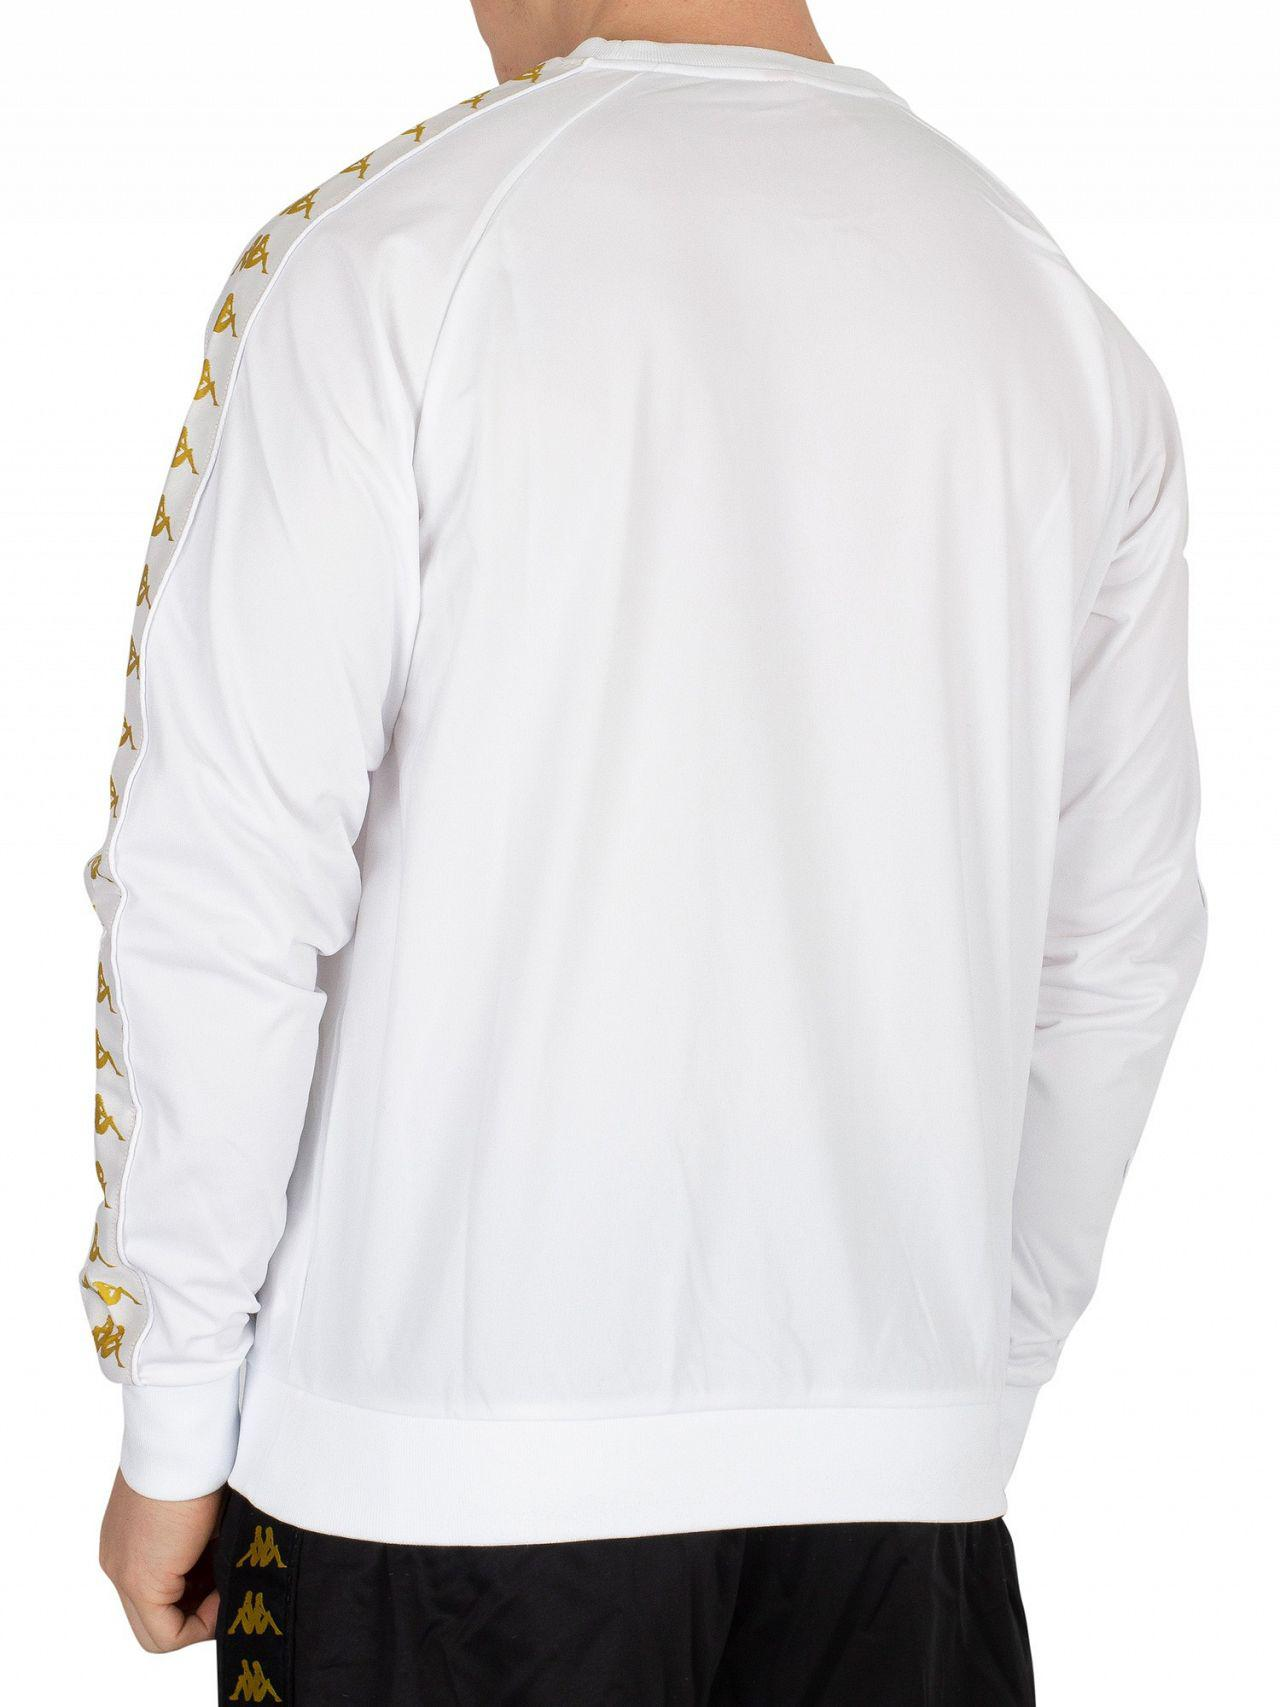 8bf73987 Kappa White/gold Ghiamis Sweatshirt in White for Men - Lyst